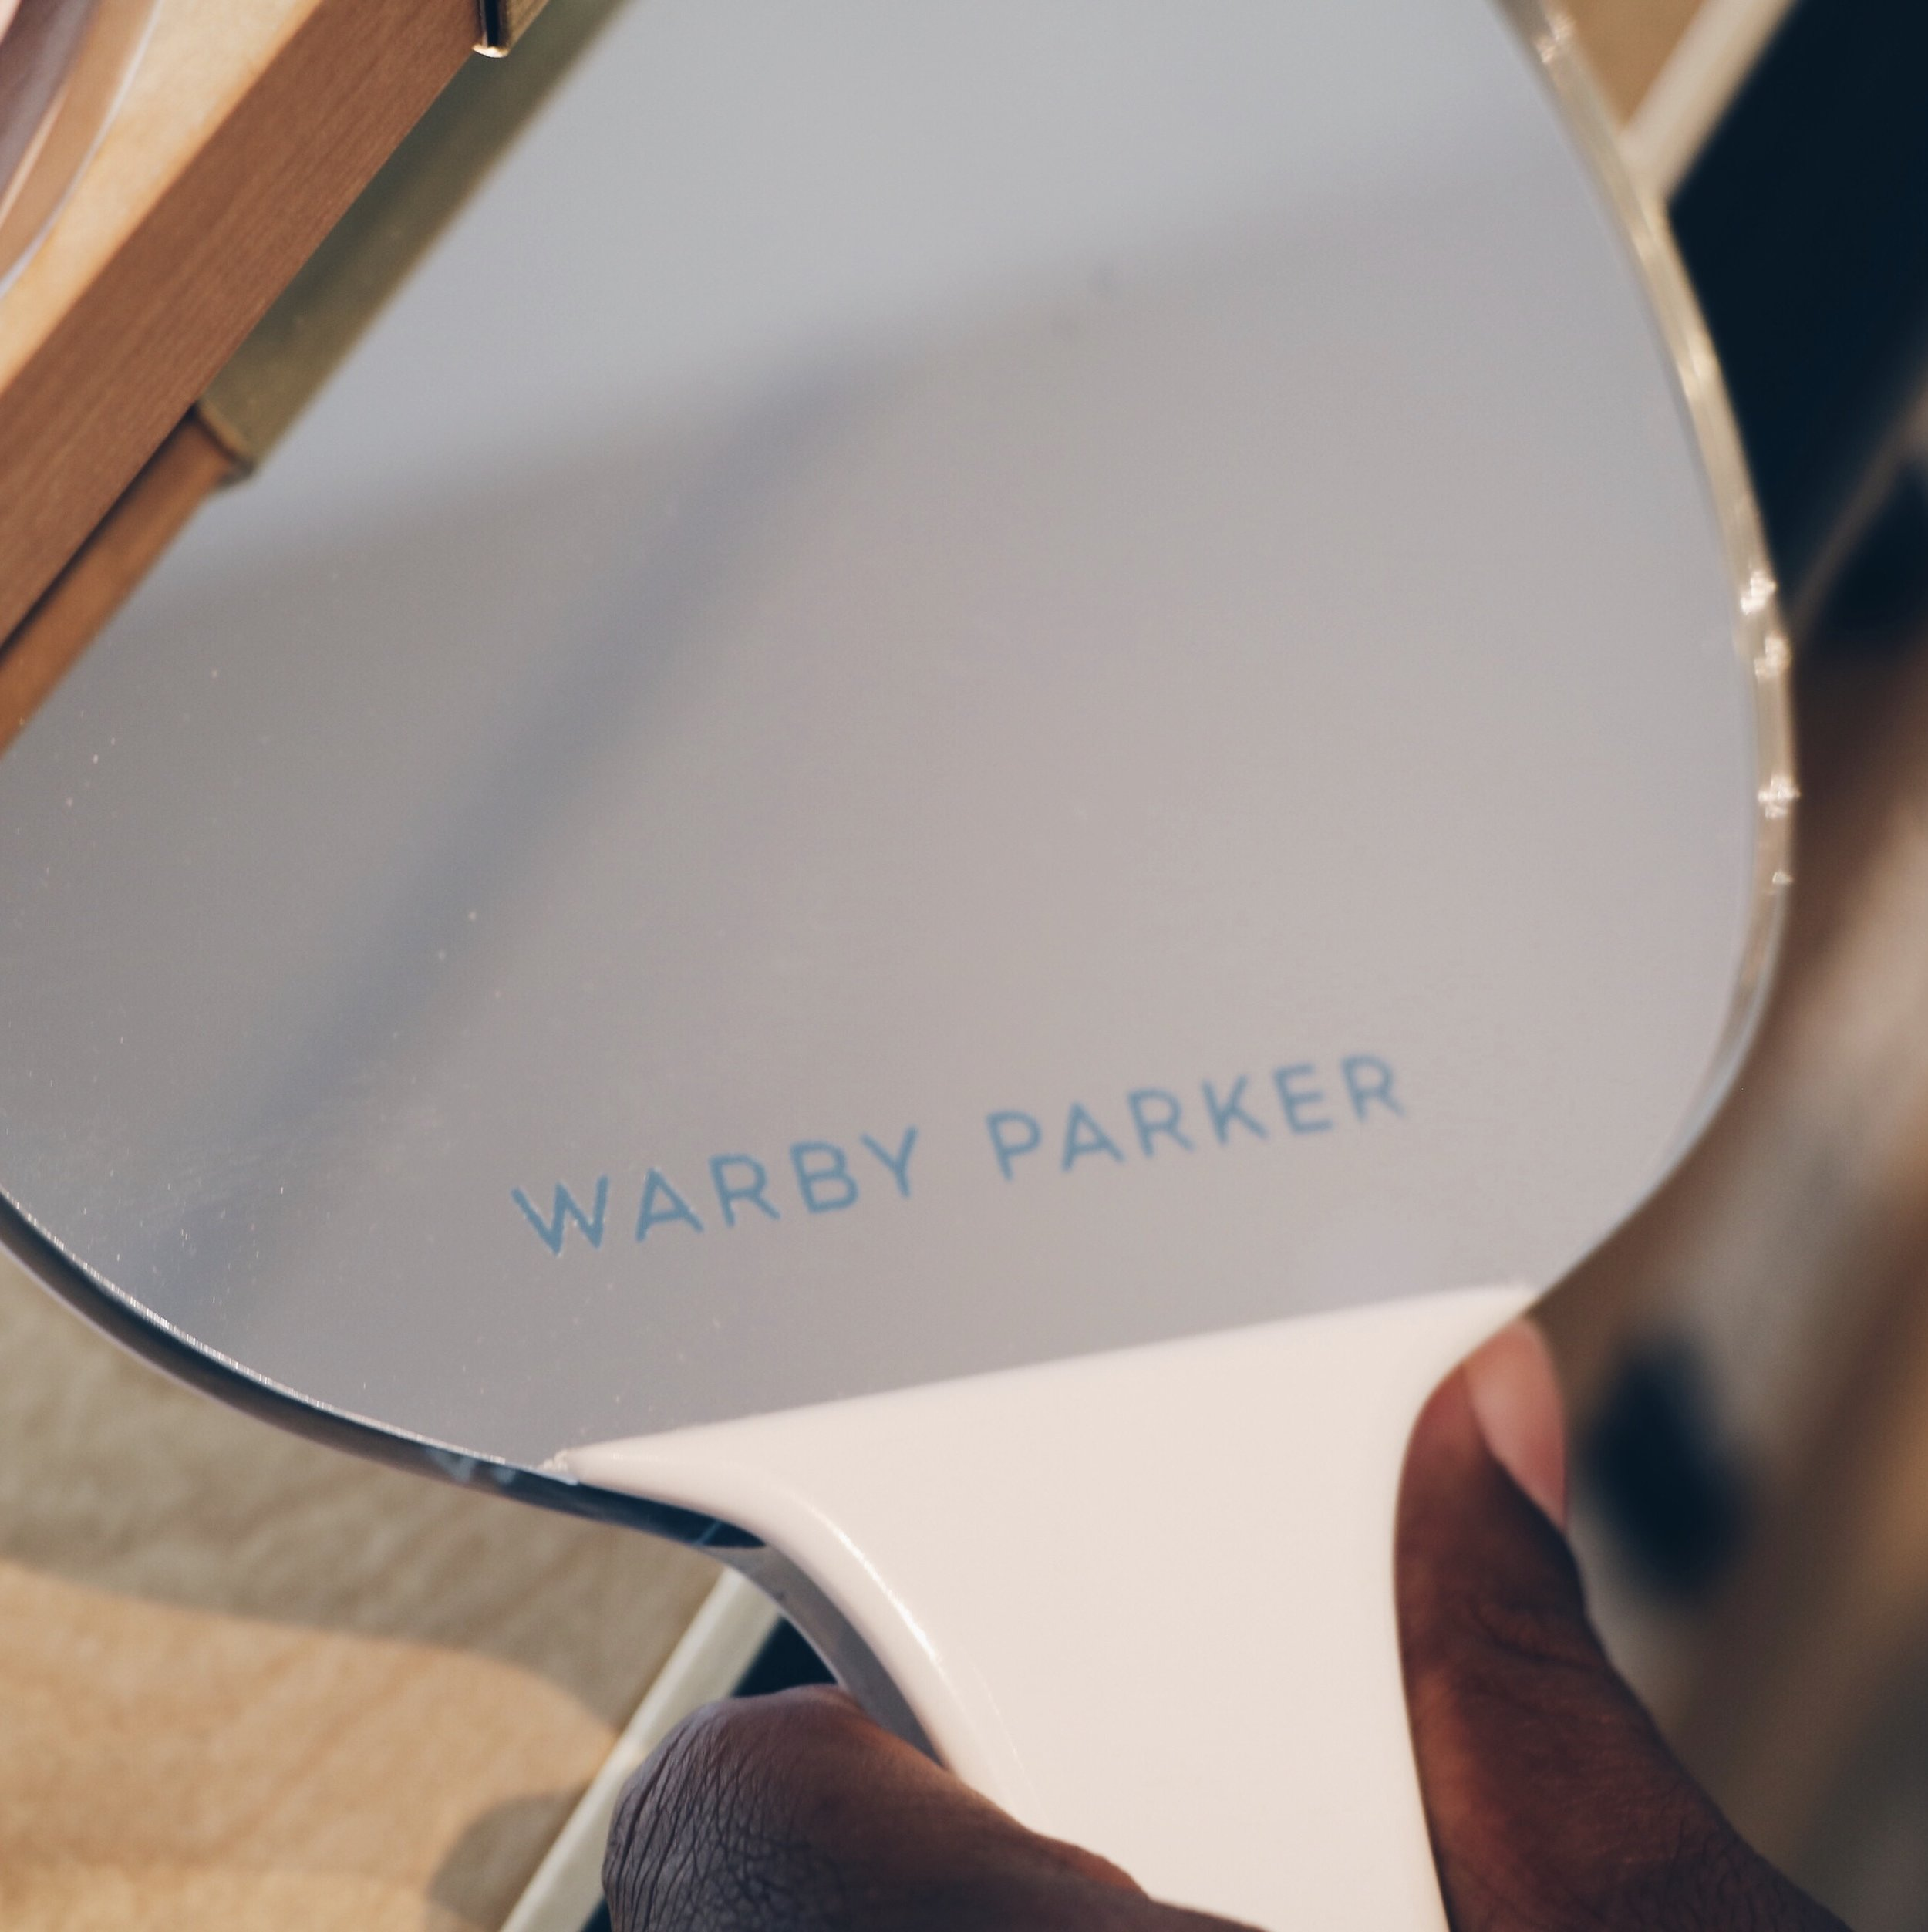 warby parker birmingham alabama 5